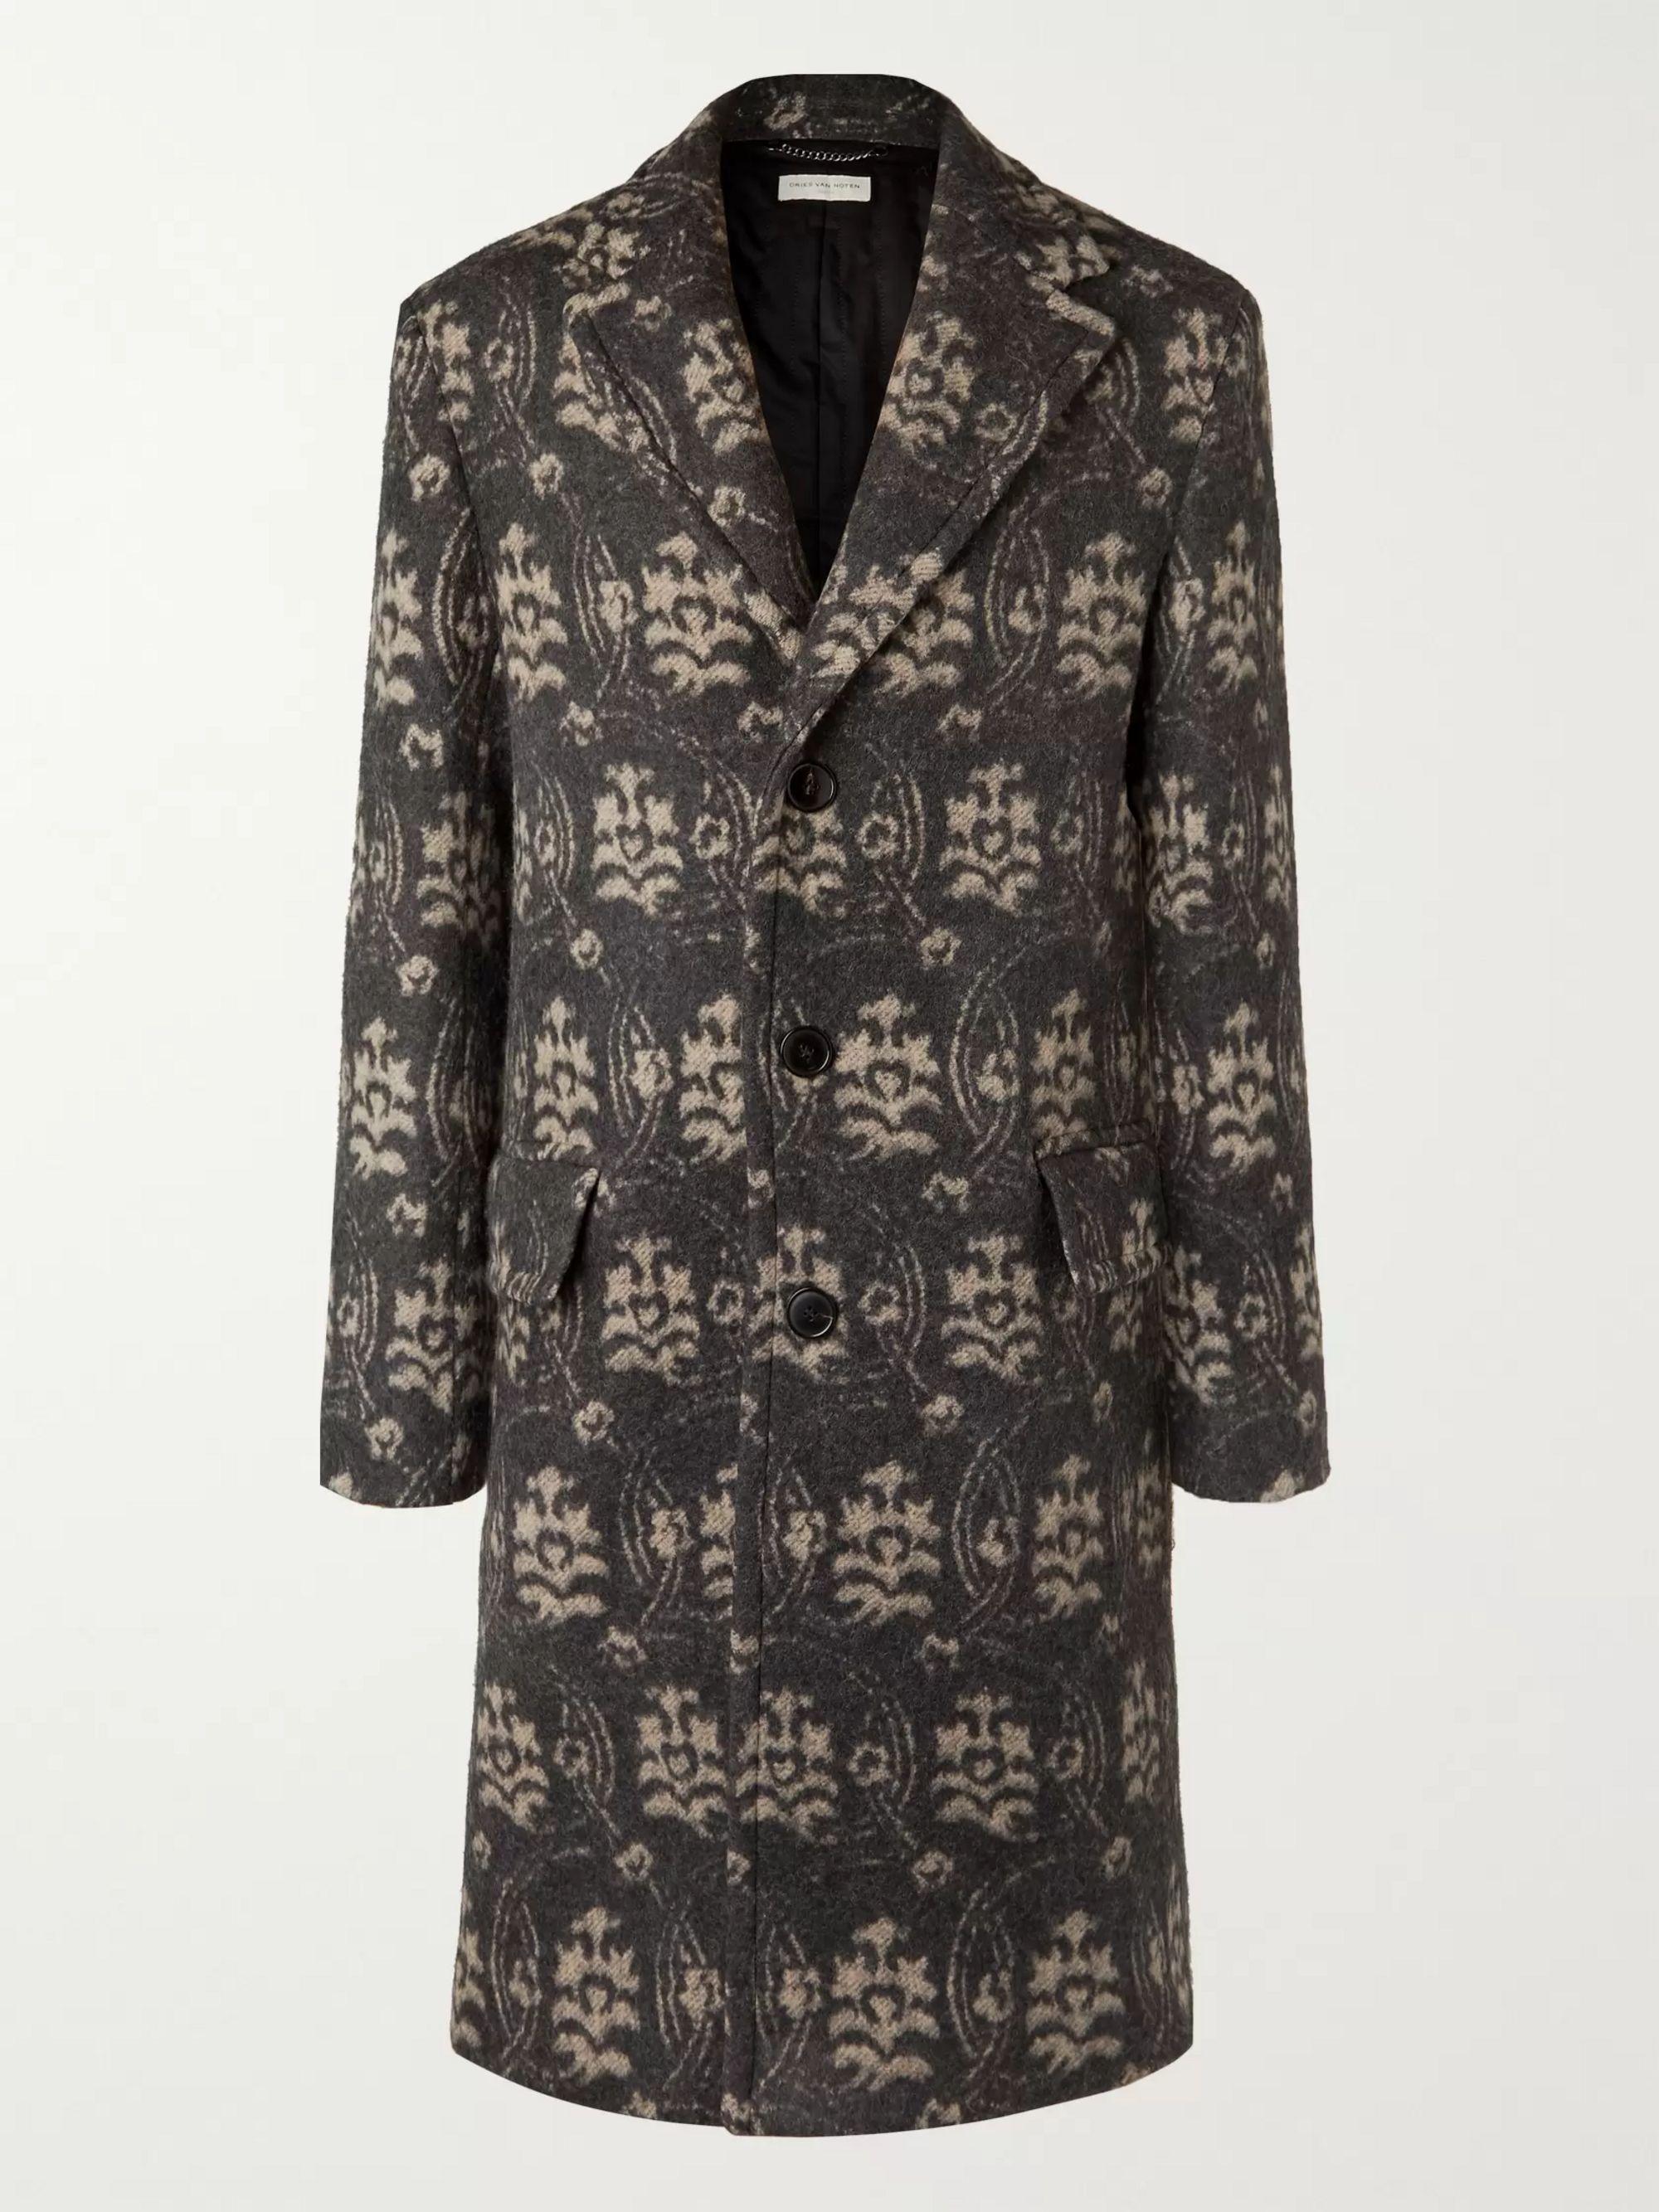 floral-jacquard-wool-blend-overcoat by dries-van-noten